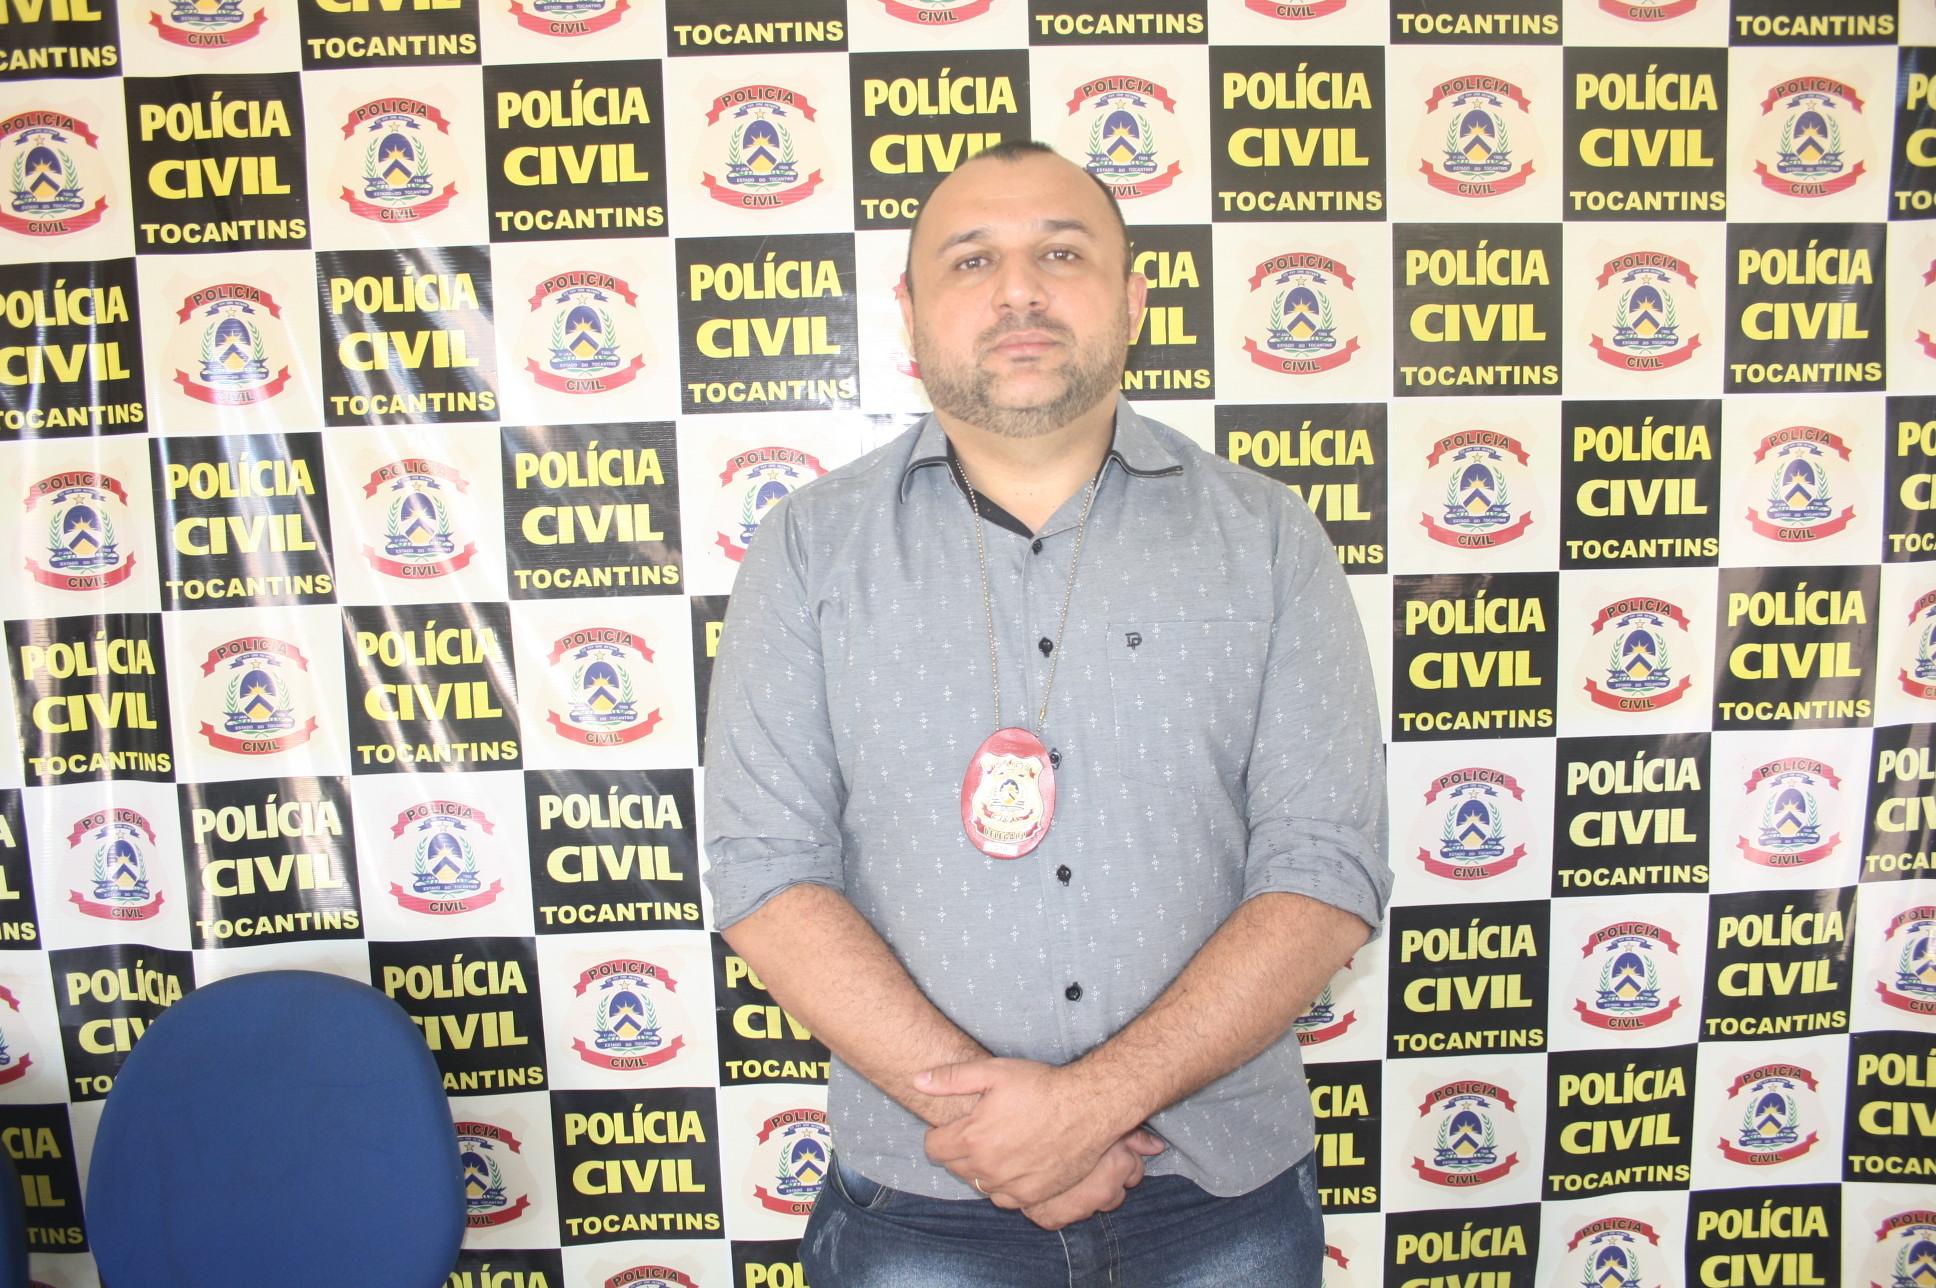 Delegado Manoel Frota chega para coordenar Polícia Civil de Divinópolis